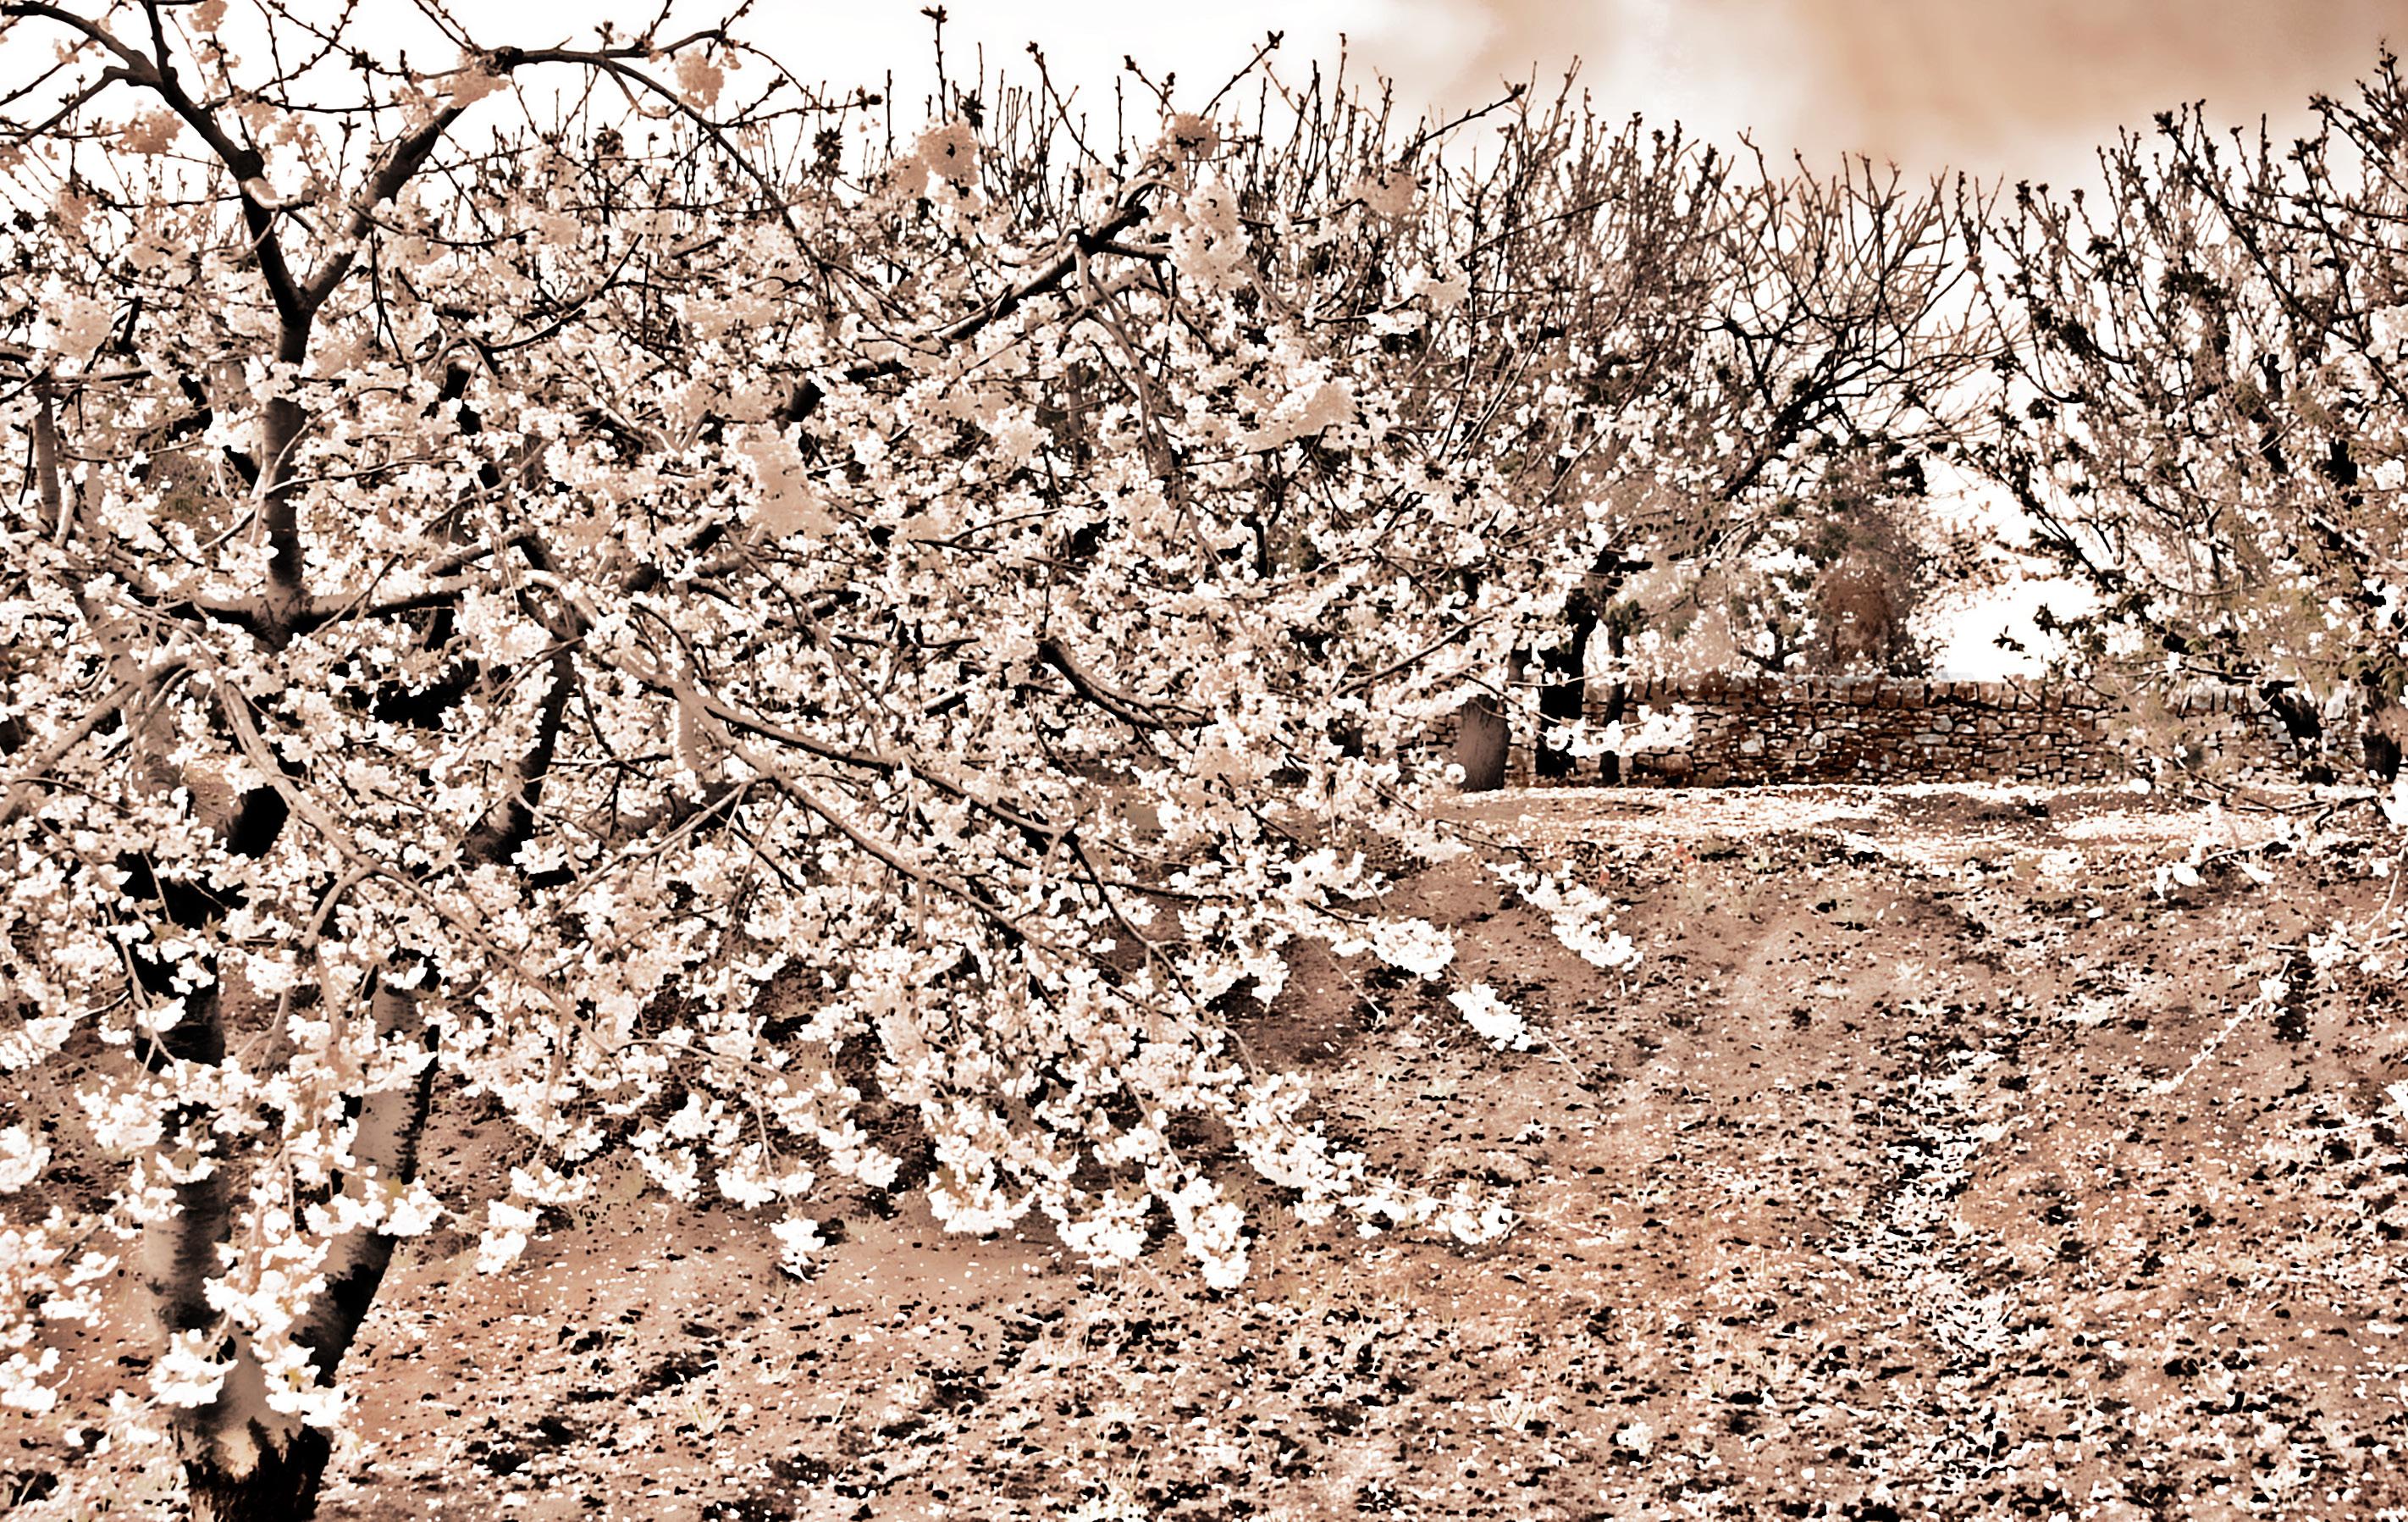 pink flowers tree spring cherryblossoms puglia springtime Alberobello apulia